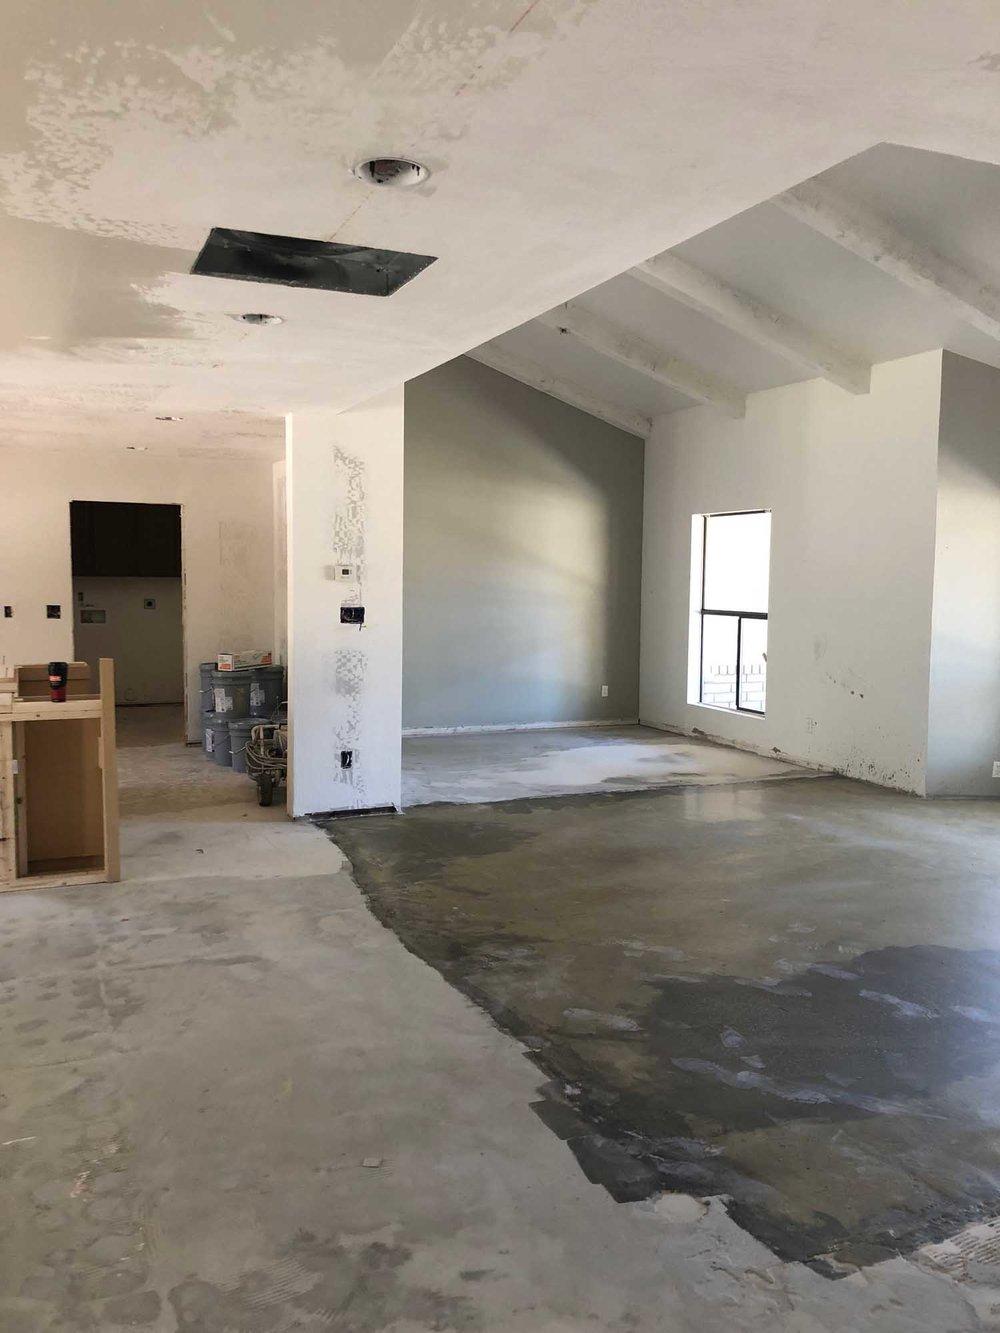 Ongoing room renovation